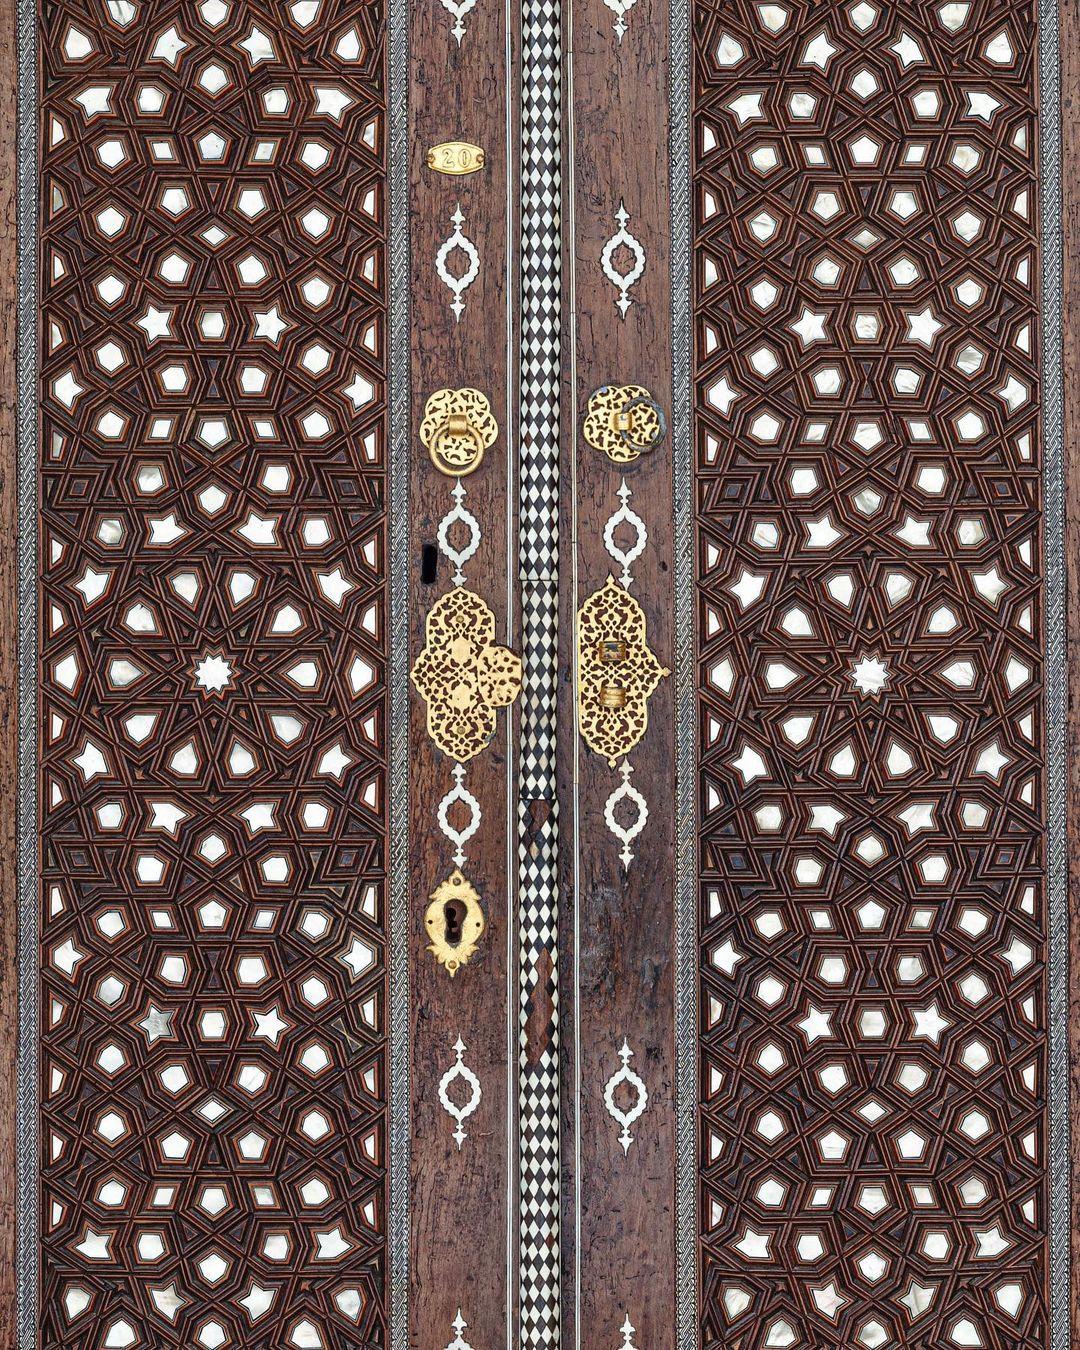 Donwload Photo Kaligrafi II.Selim Türbesi kapısı باب ضريح السلطان سليم الثاني…- ozcay